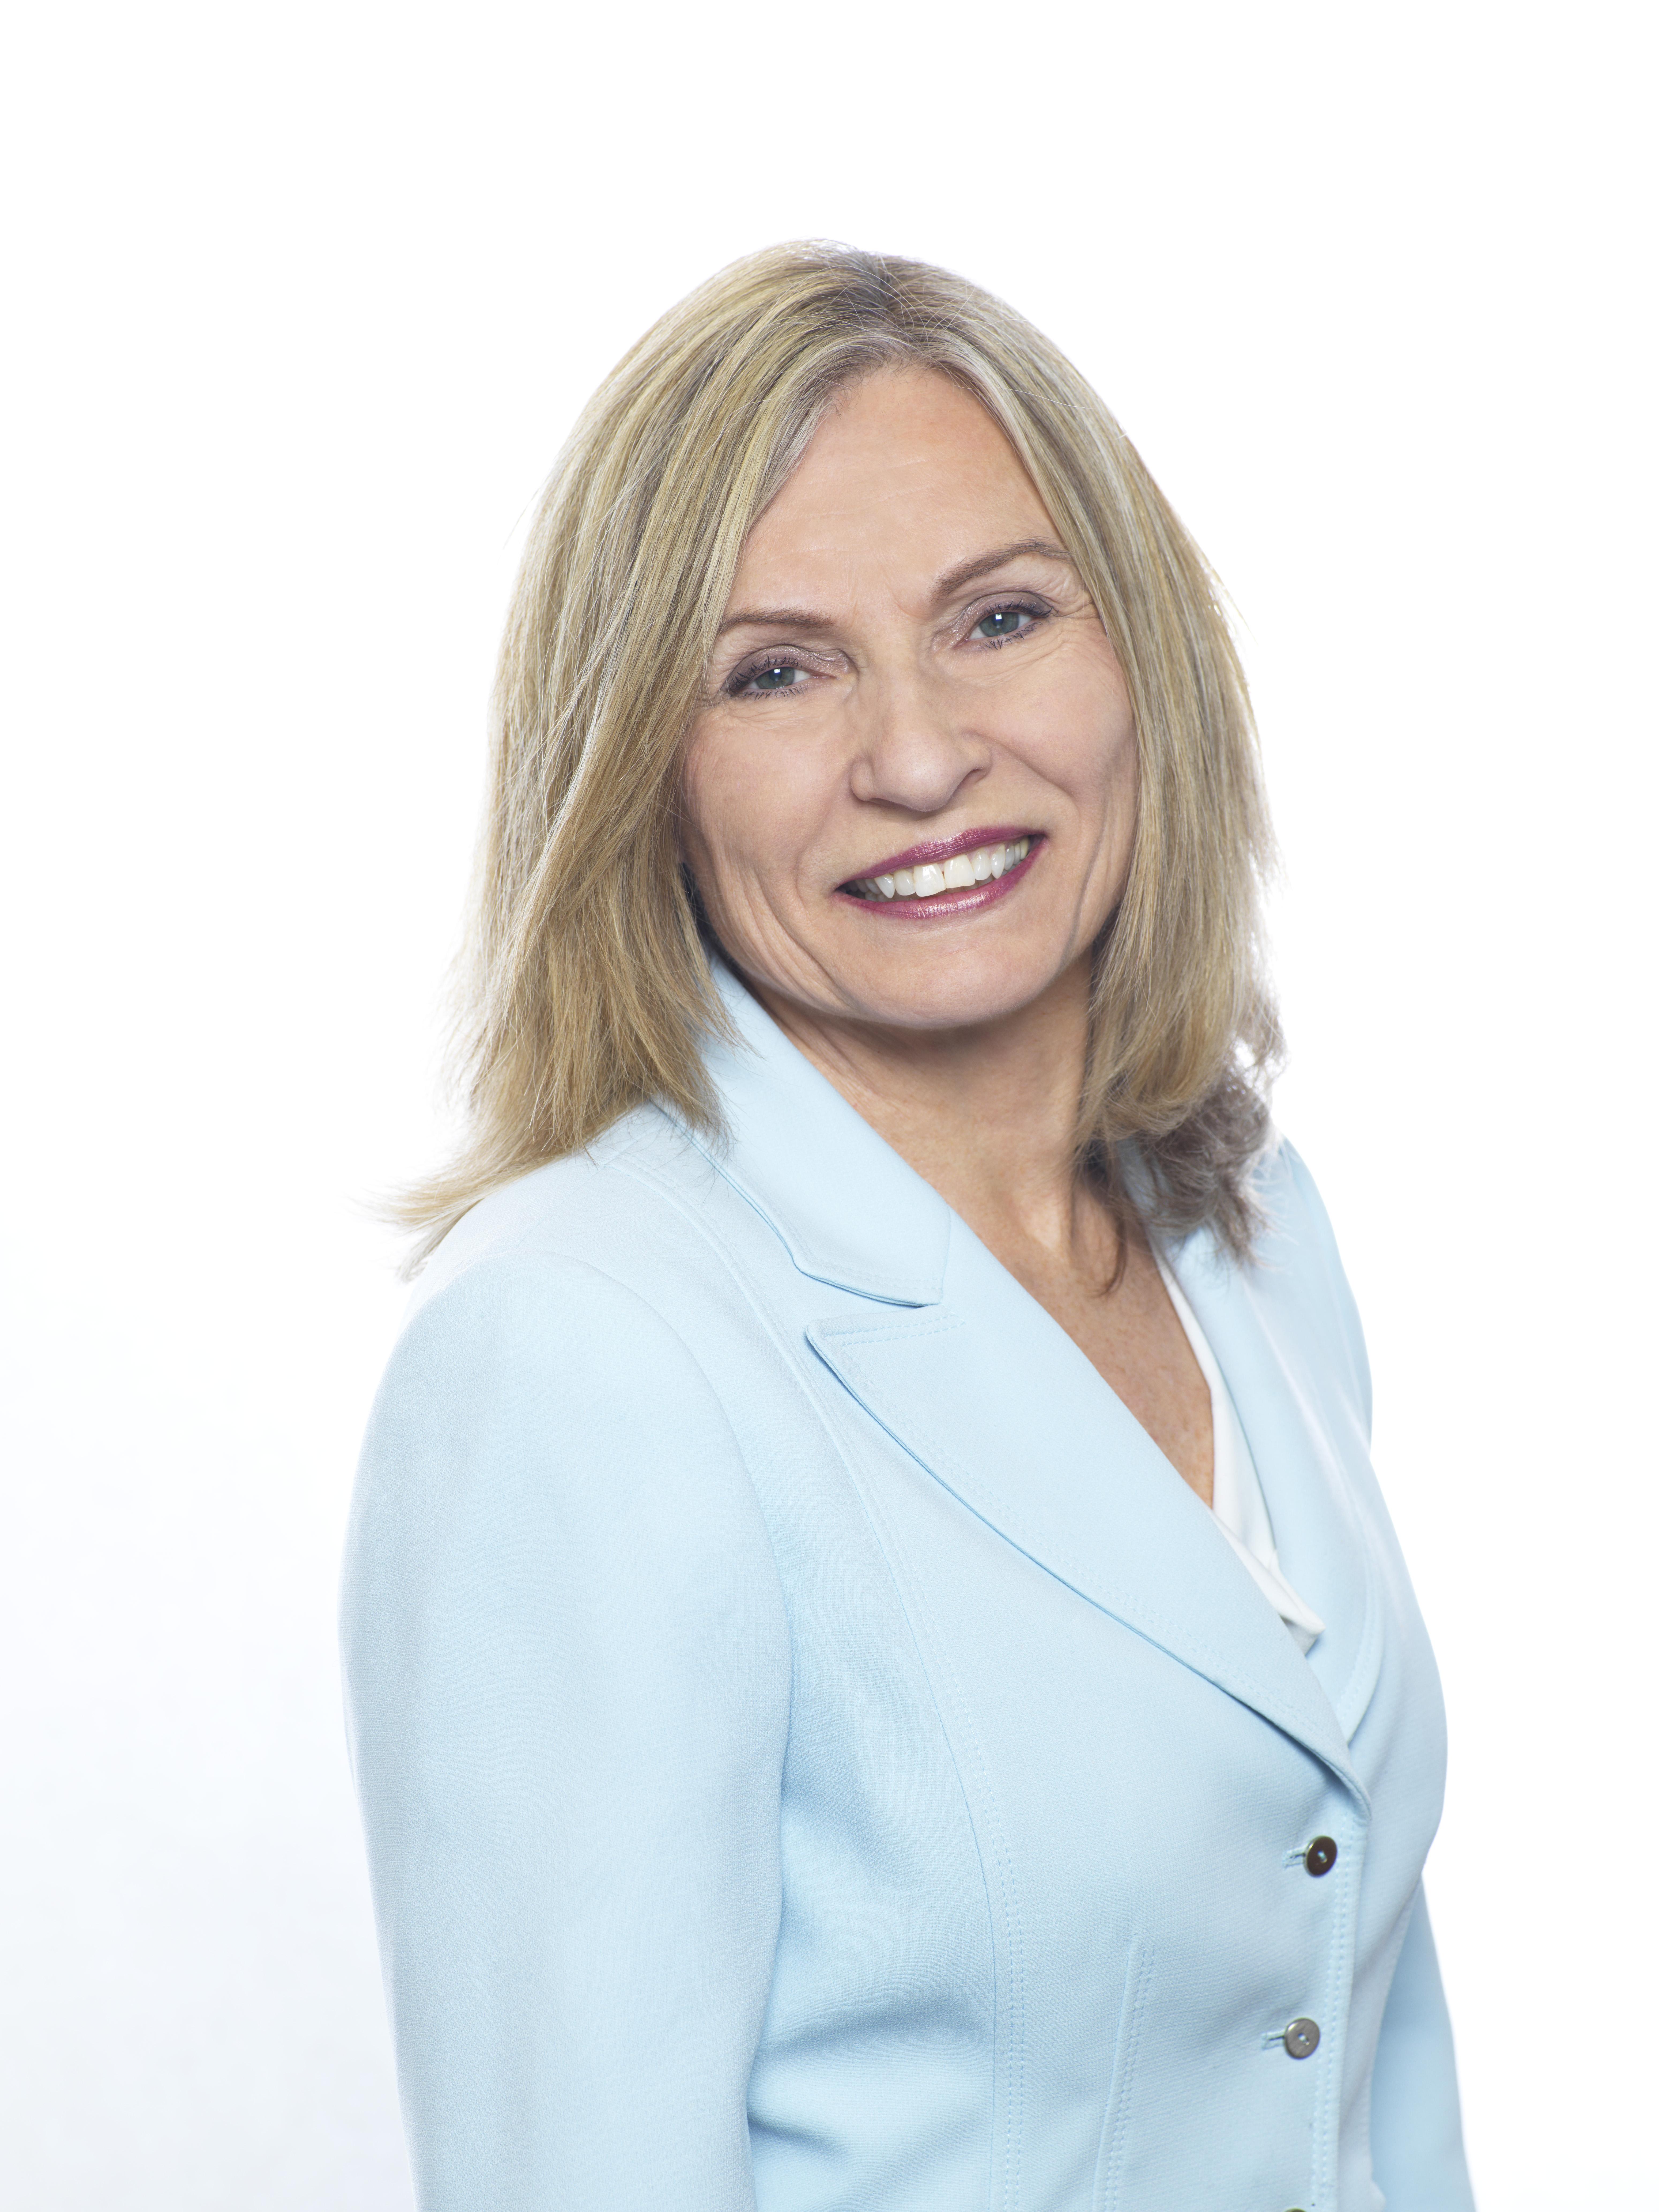 Dr. Gail H. Forsythe